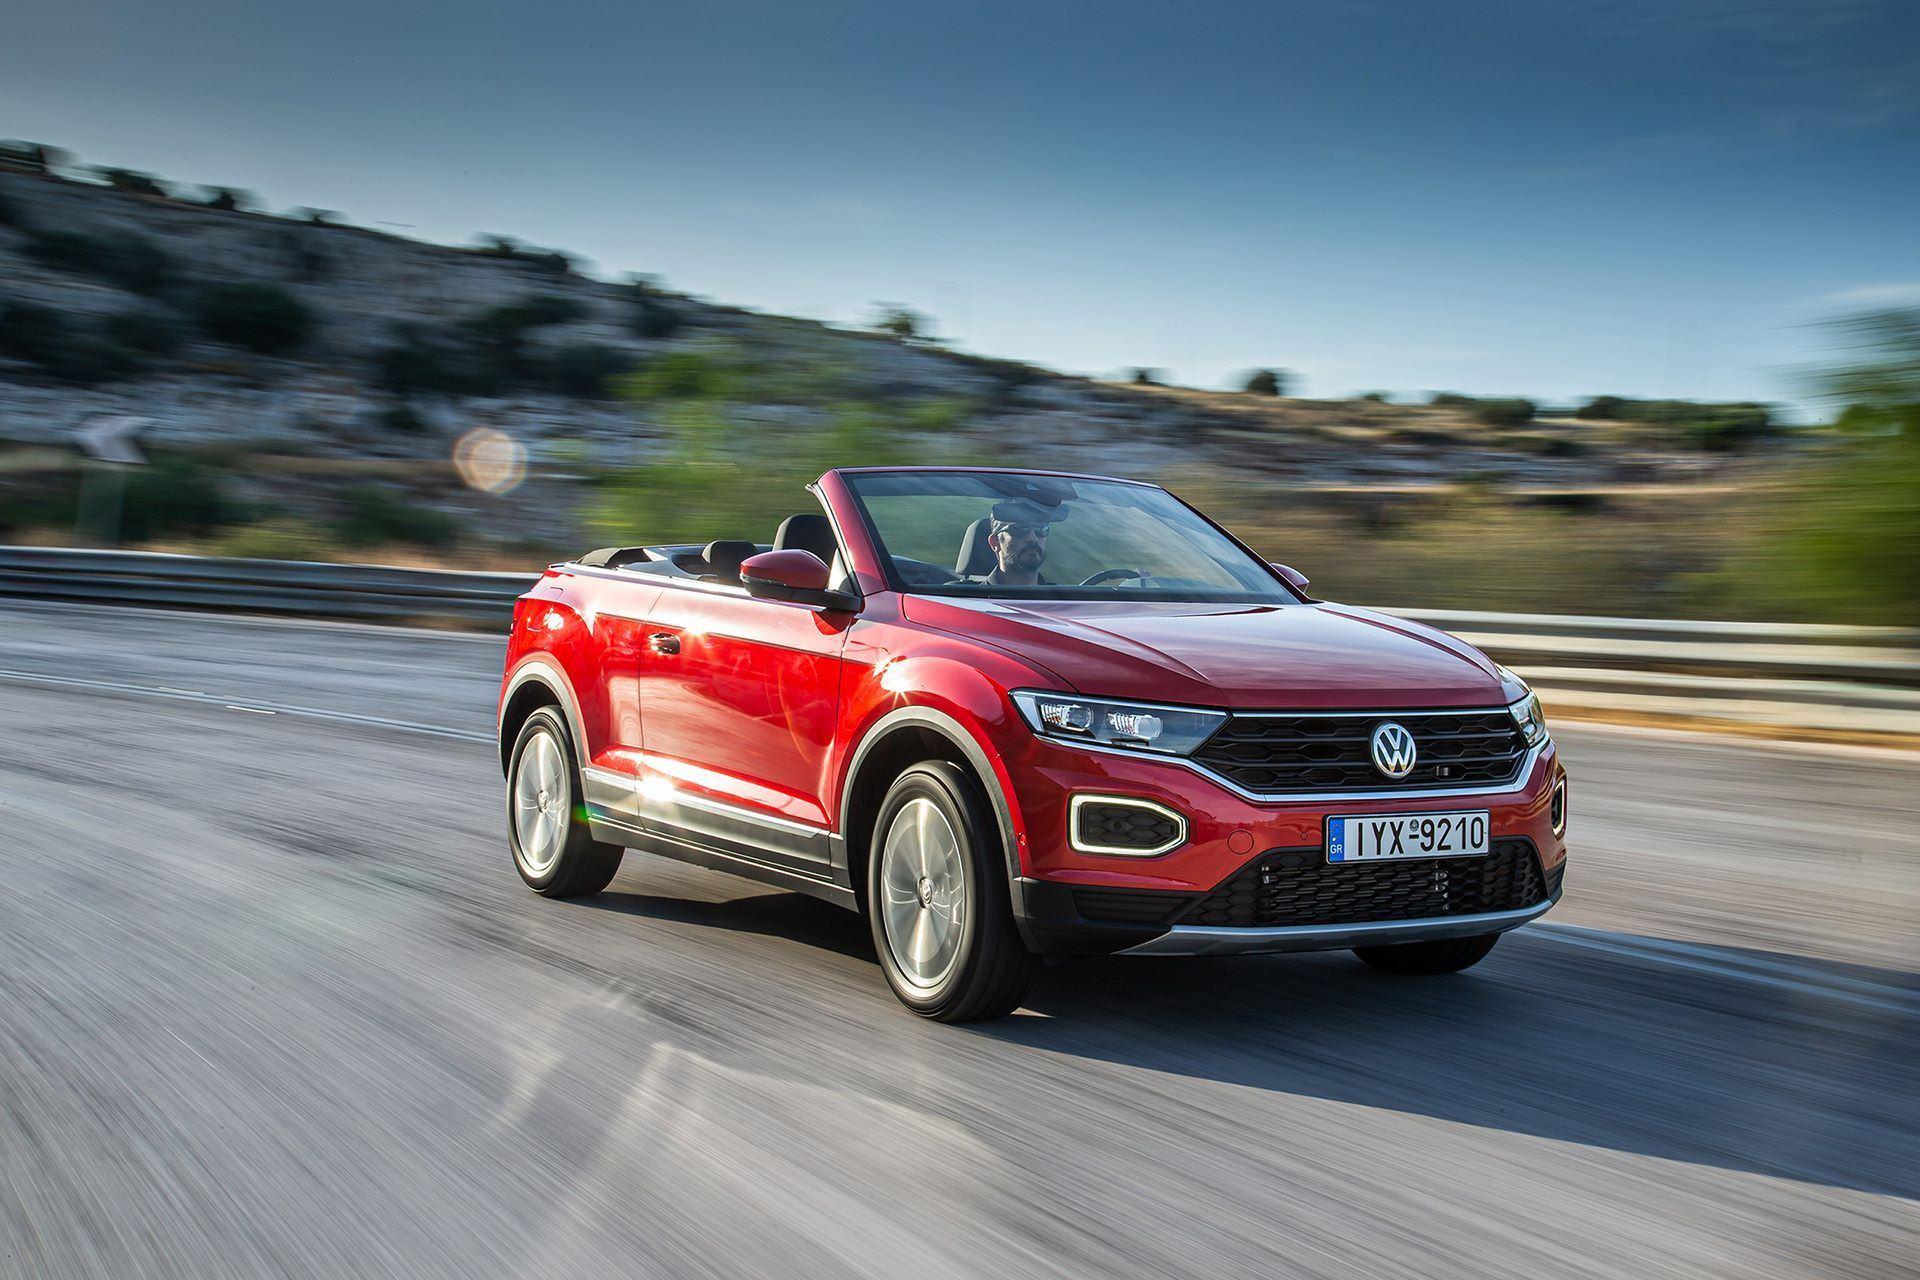 Volkswagen-T-Roc-Cabriolet-Greece-50